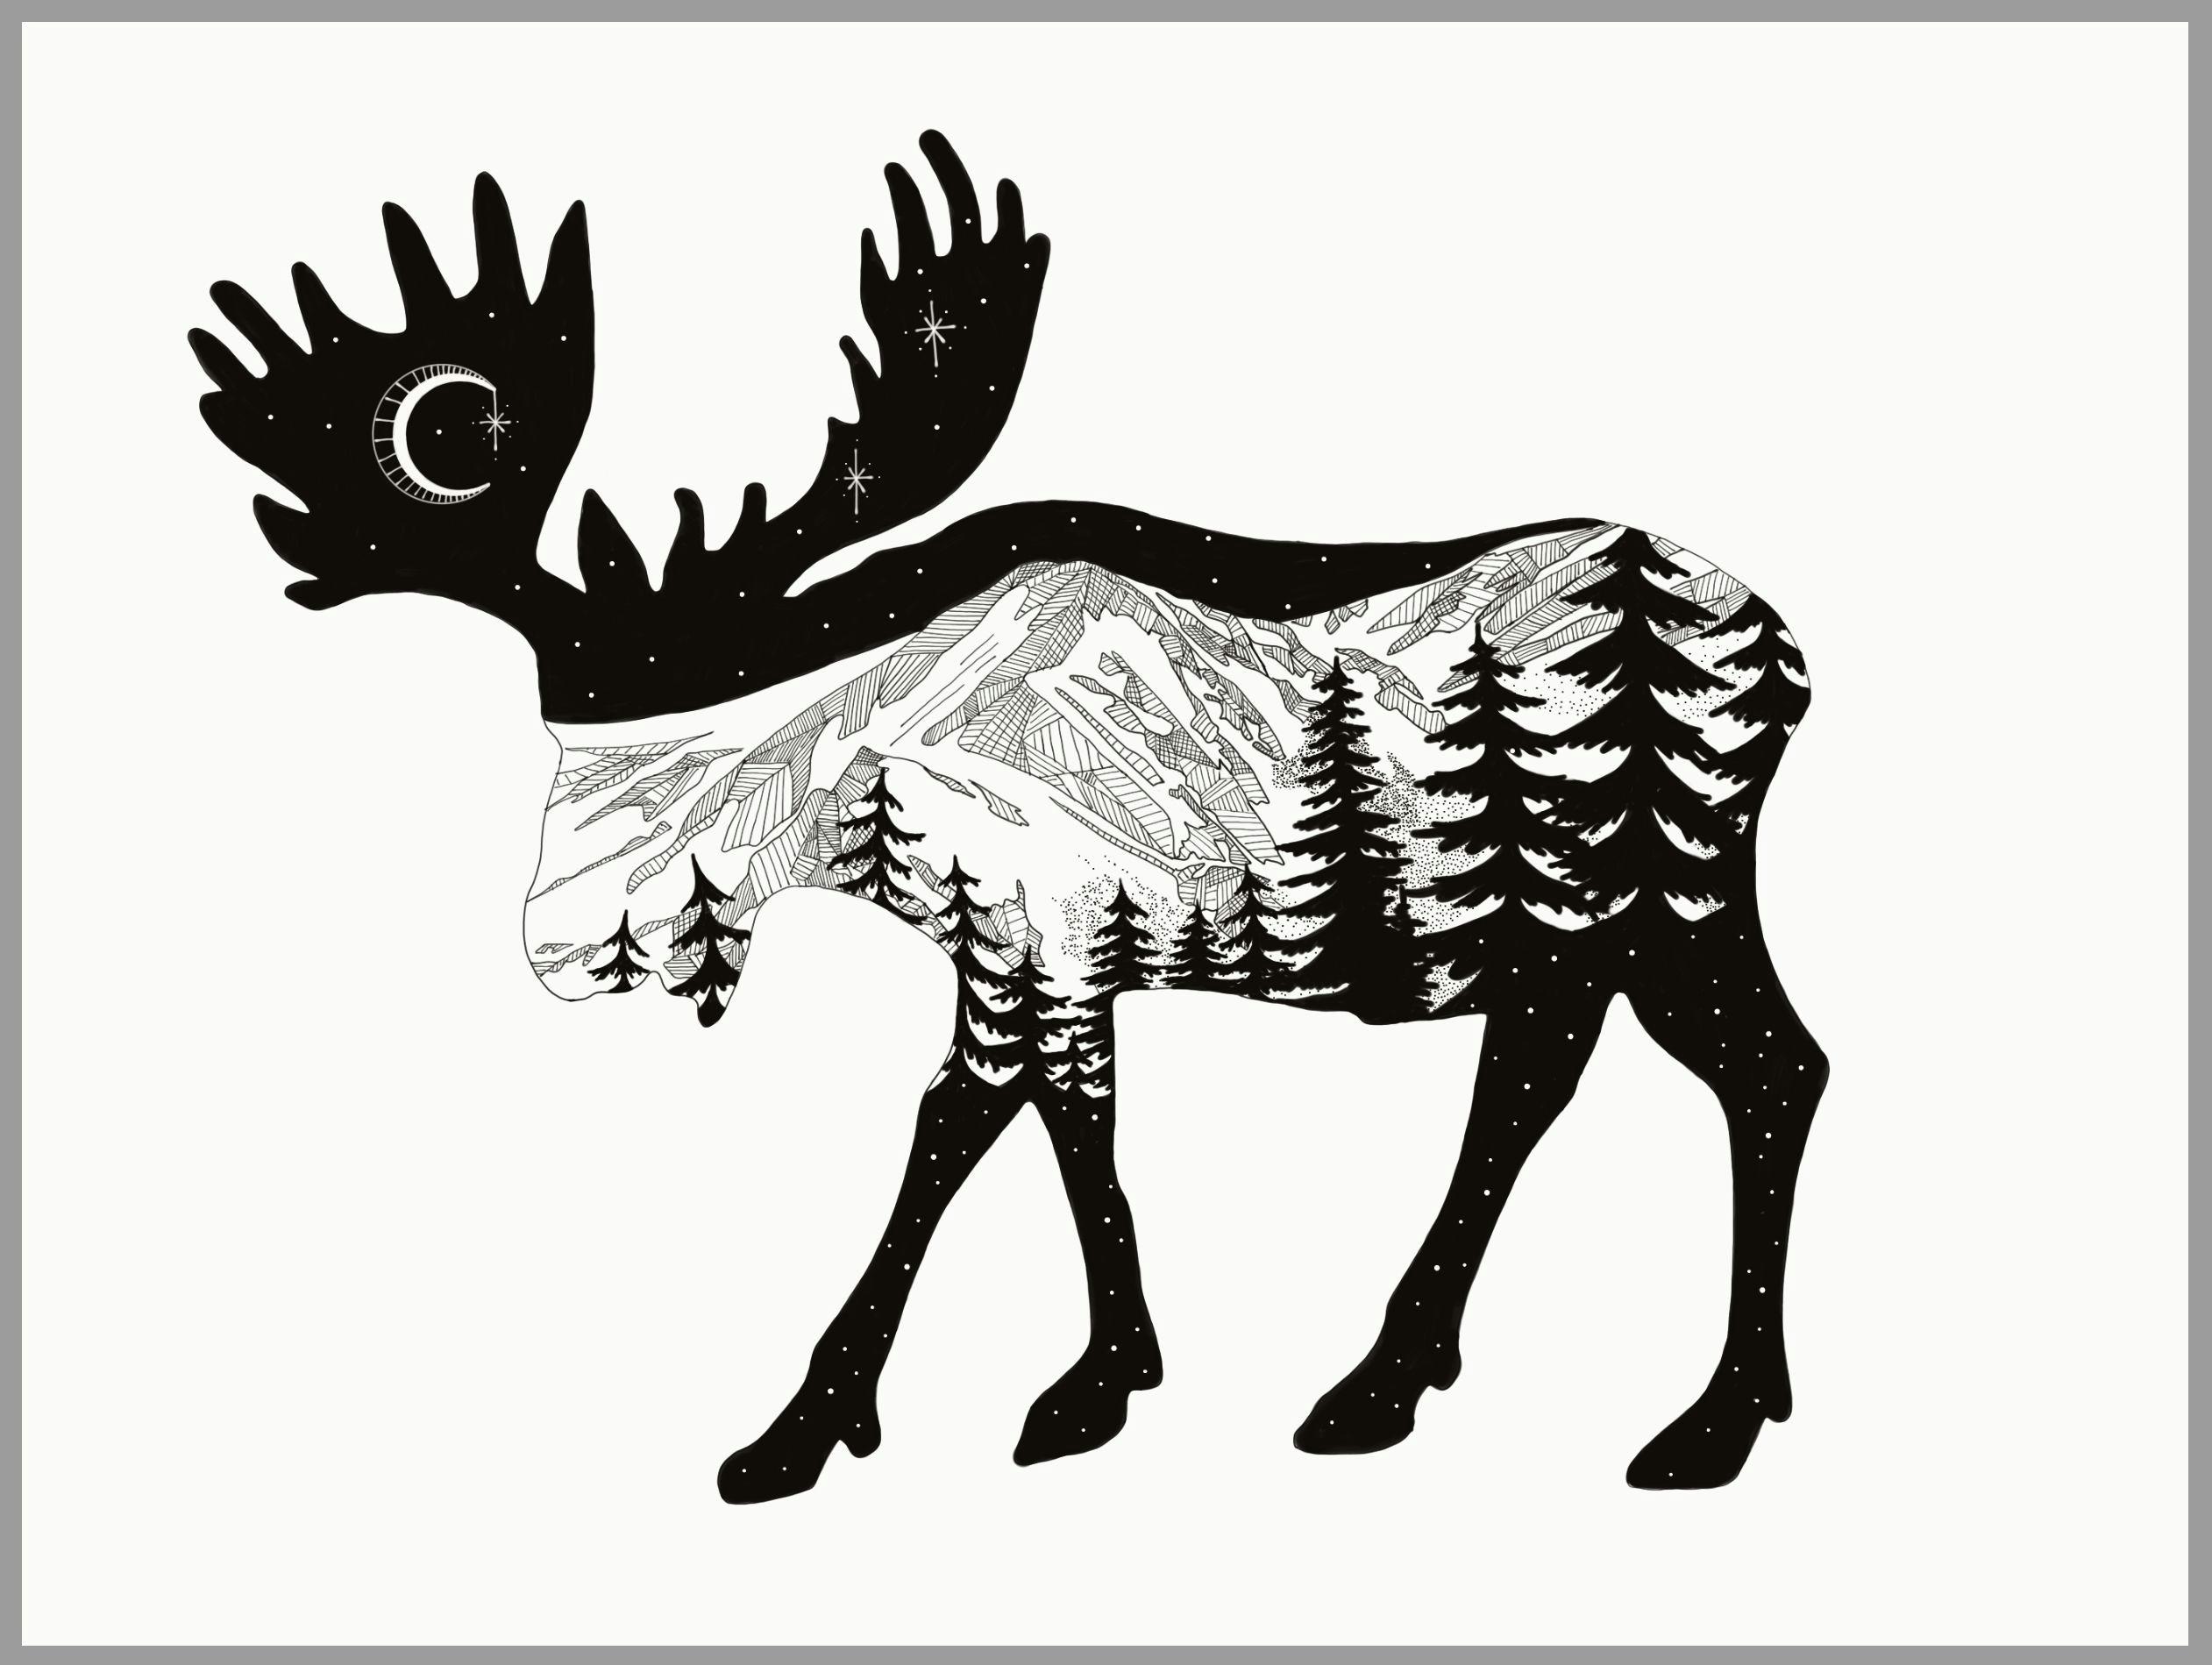 Drawing Cartoon Mountains Moose Mountain Drawing Using Adobe Sketch the Mountain Range is